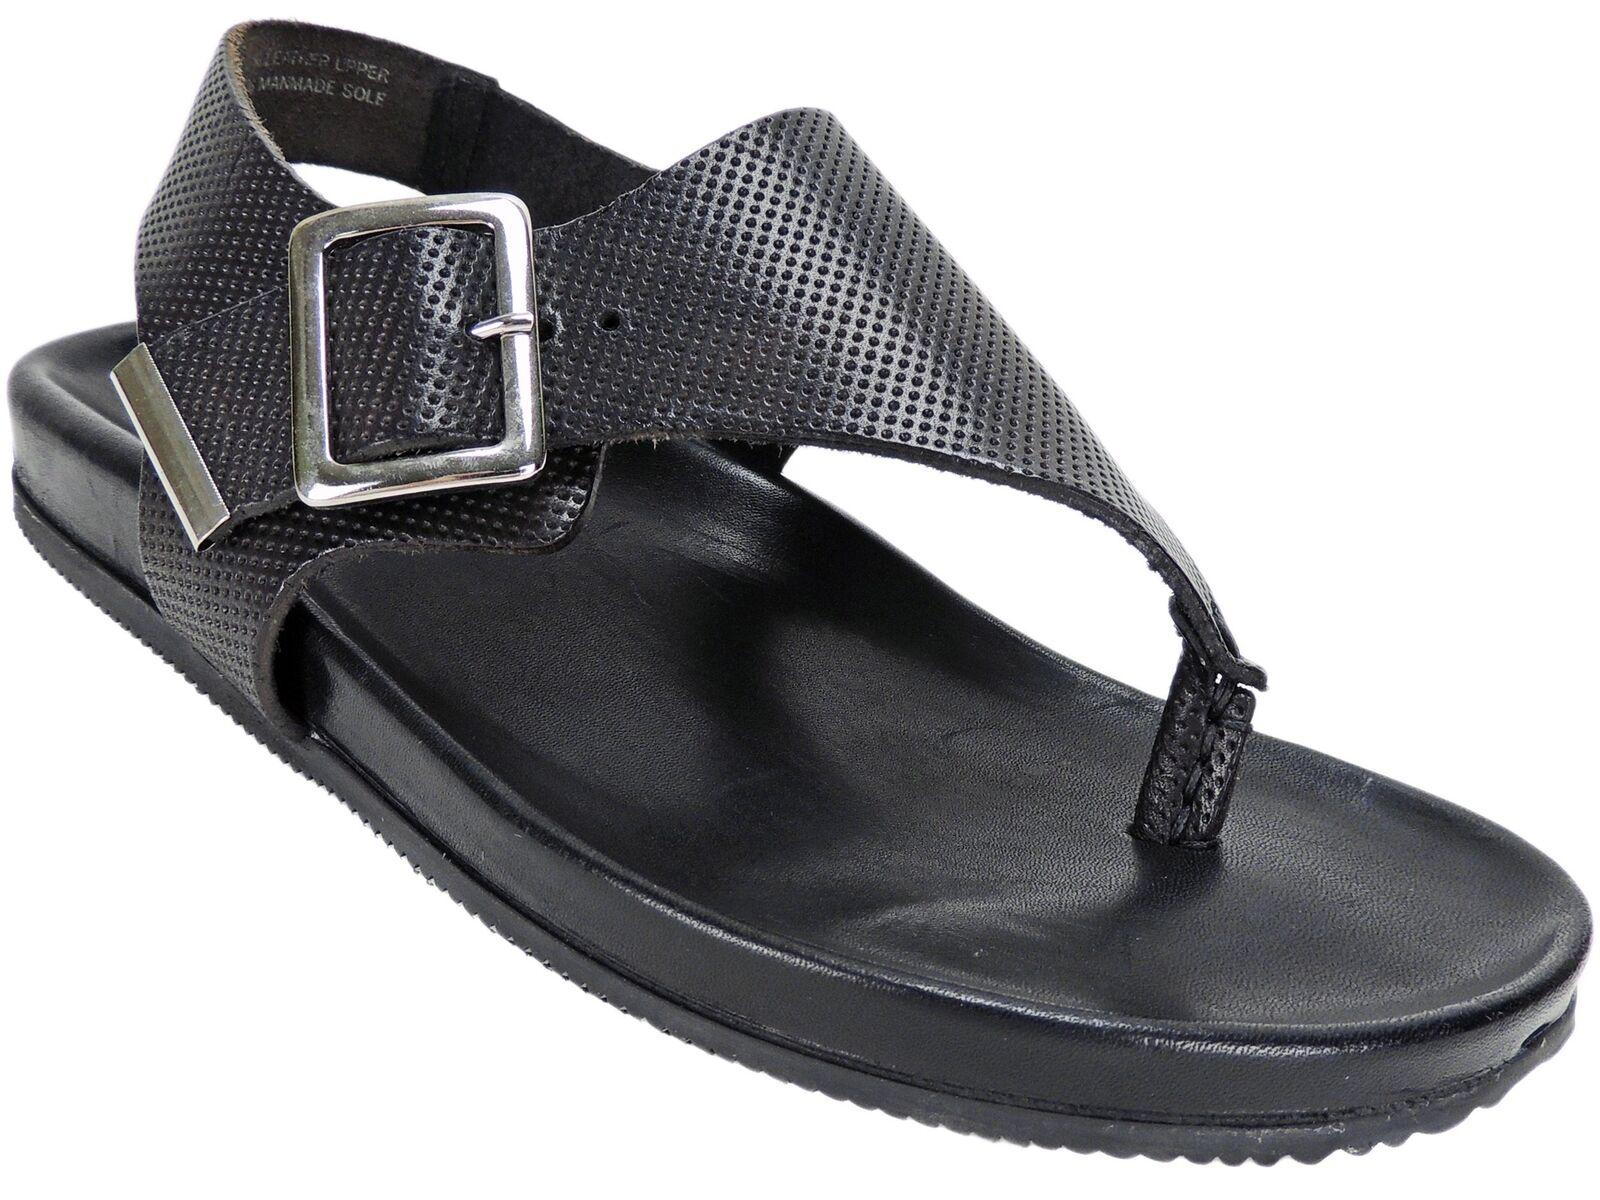 Emozioni Women's W1390 Thong Sandals Black Leather Size M; US 7.5 M